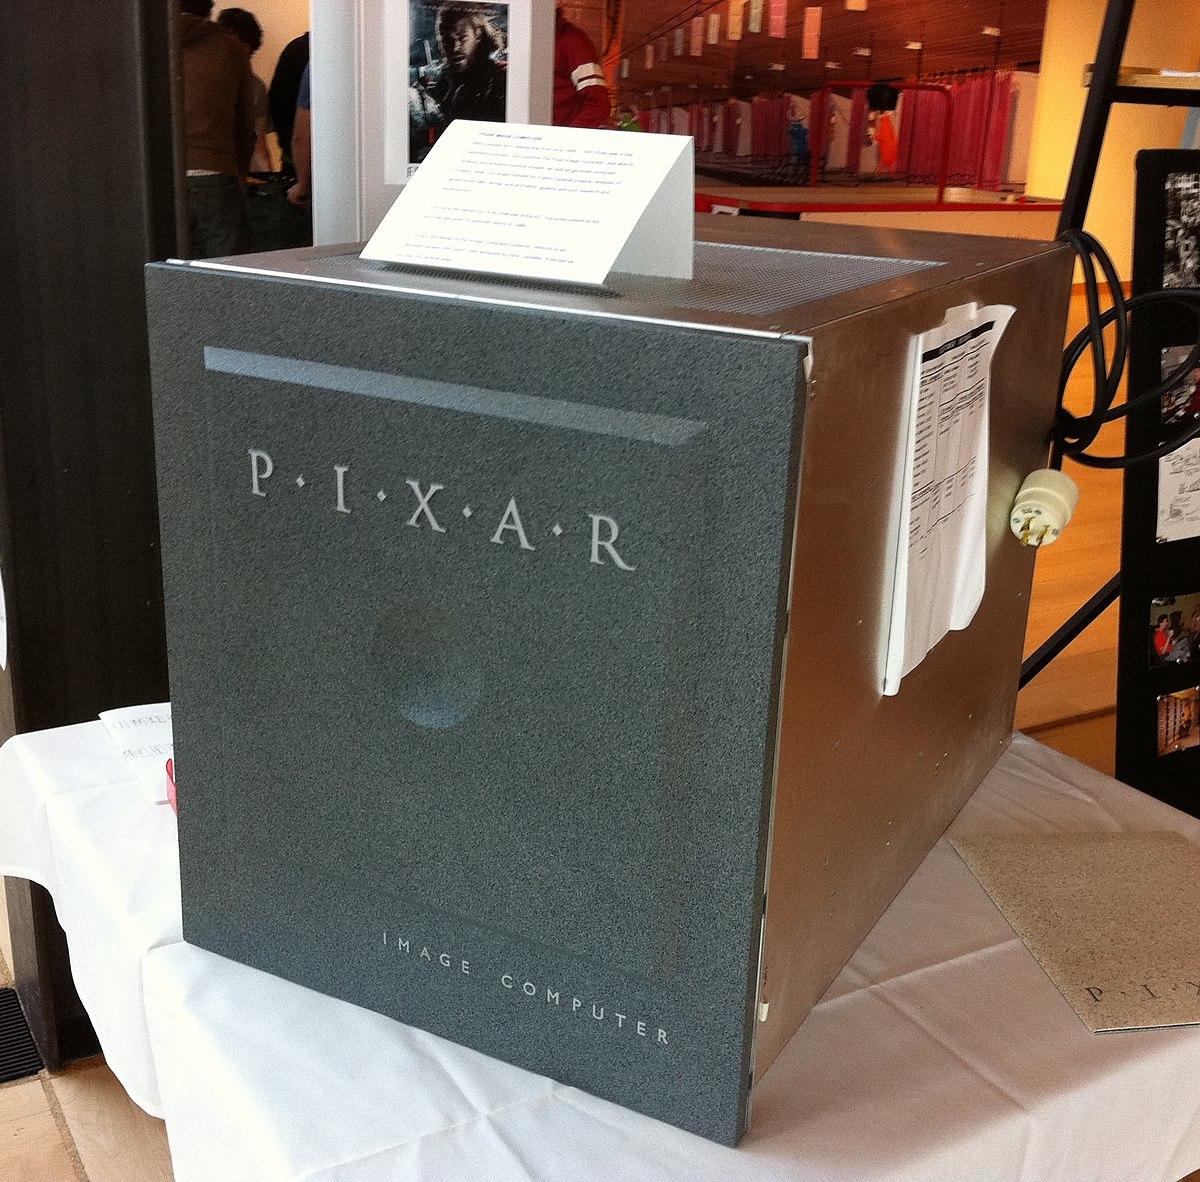 Pixar Image Computer - Wikipedia